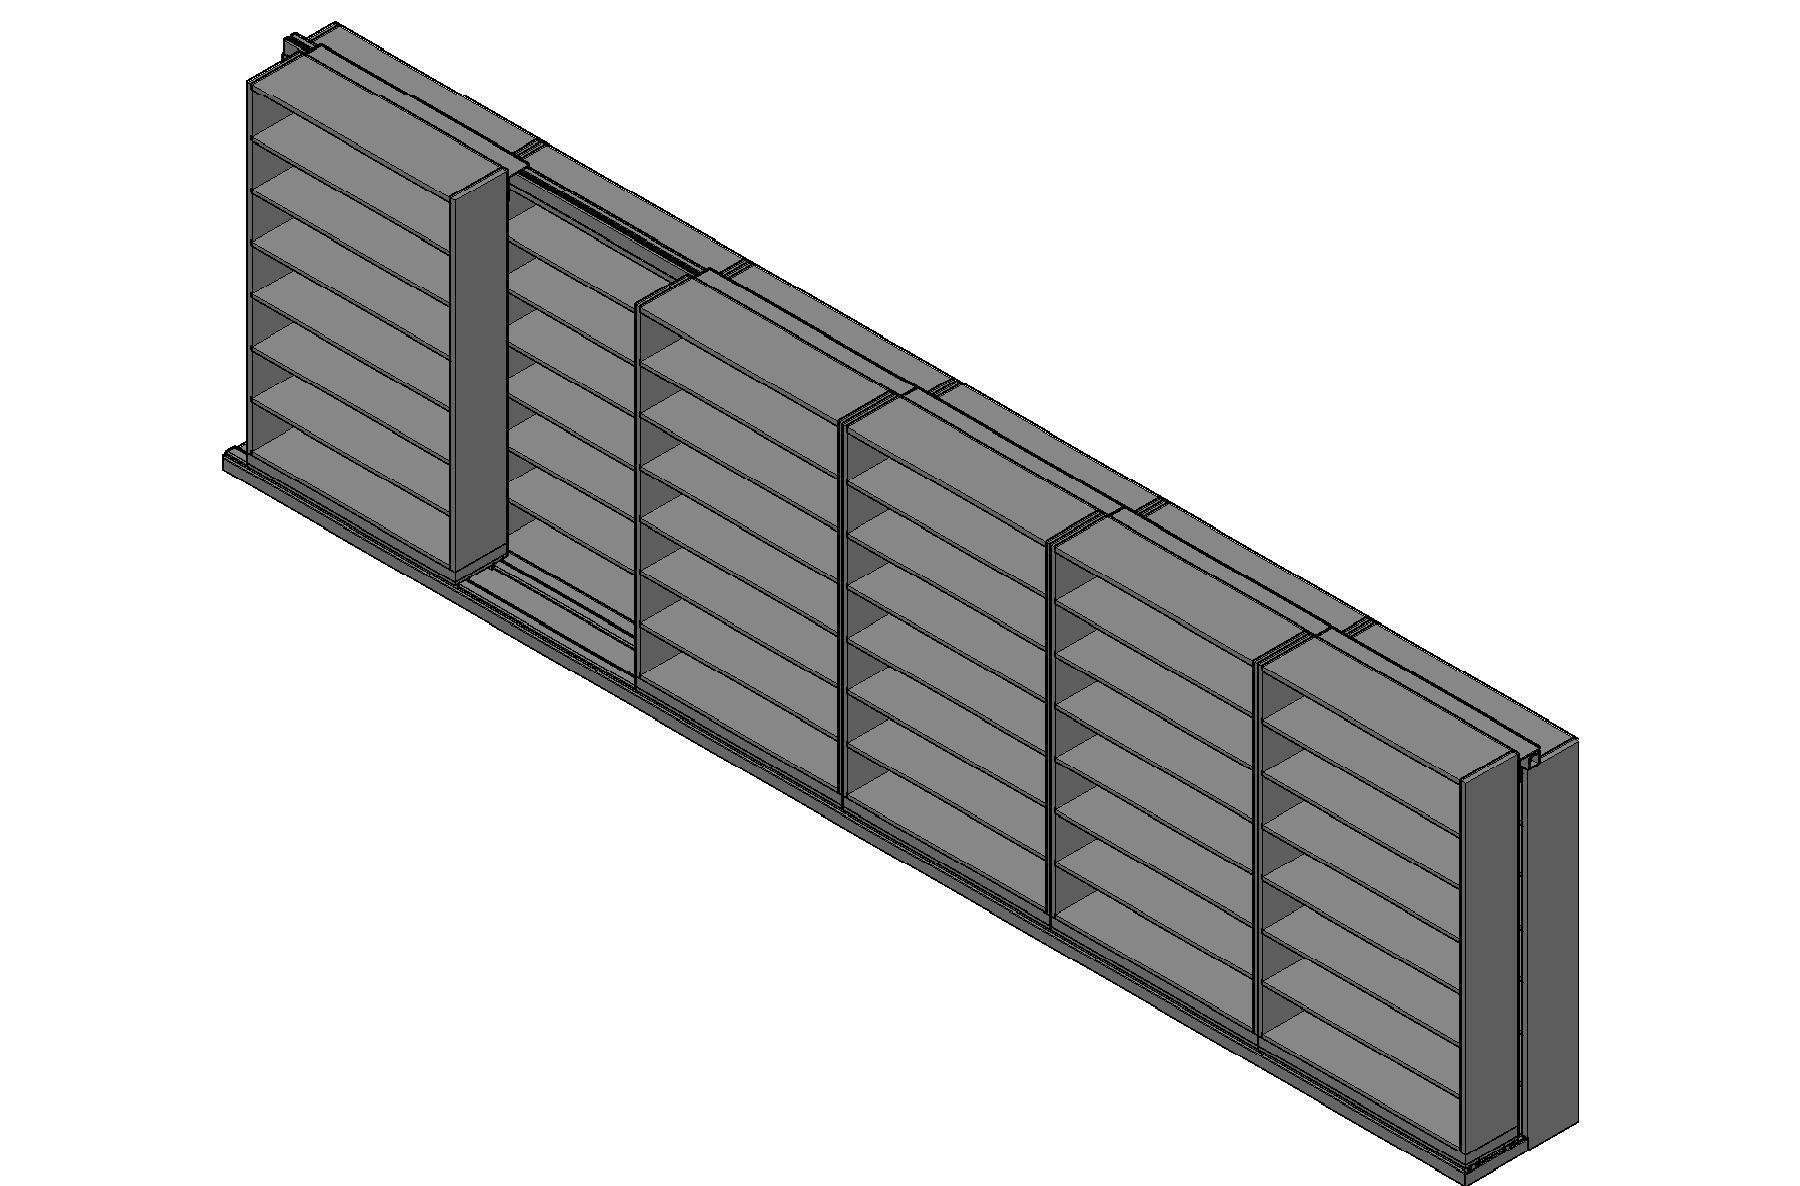 "Letter Size Sliding Shelves - 2 Rows Deep - 7 Levels - (48"" x 12"" Shelves) - 292"" Total Width"